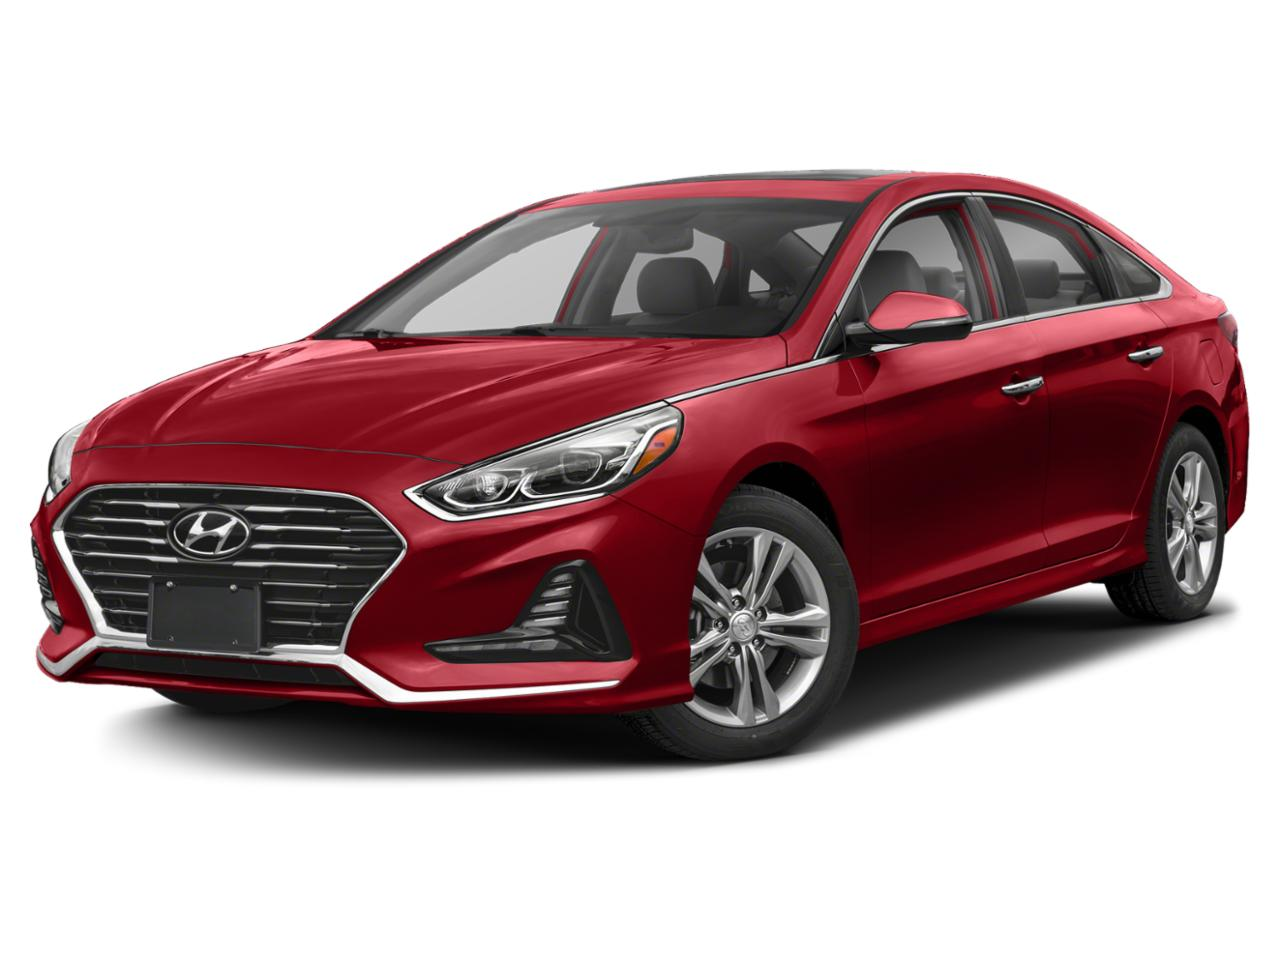 2019 Hyundai Sonata Vehicle Photo in San Antonio, TX 78238